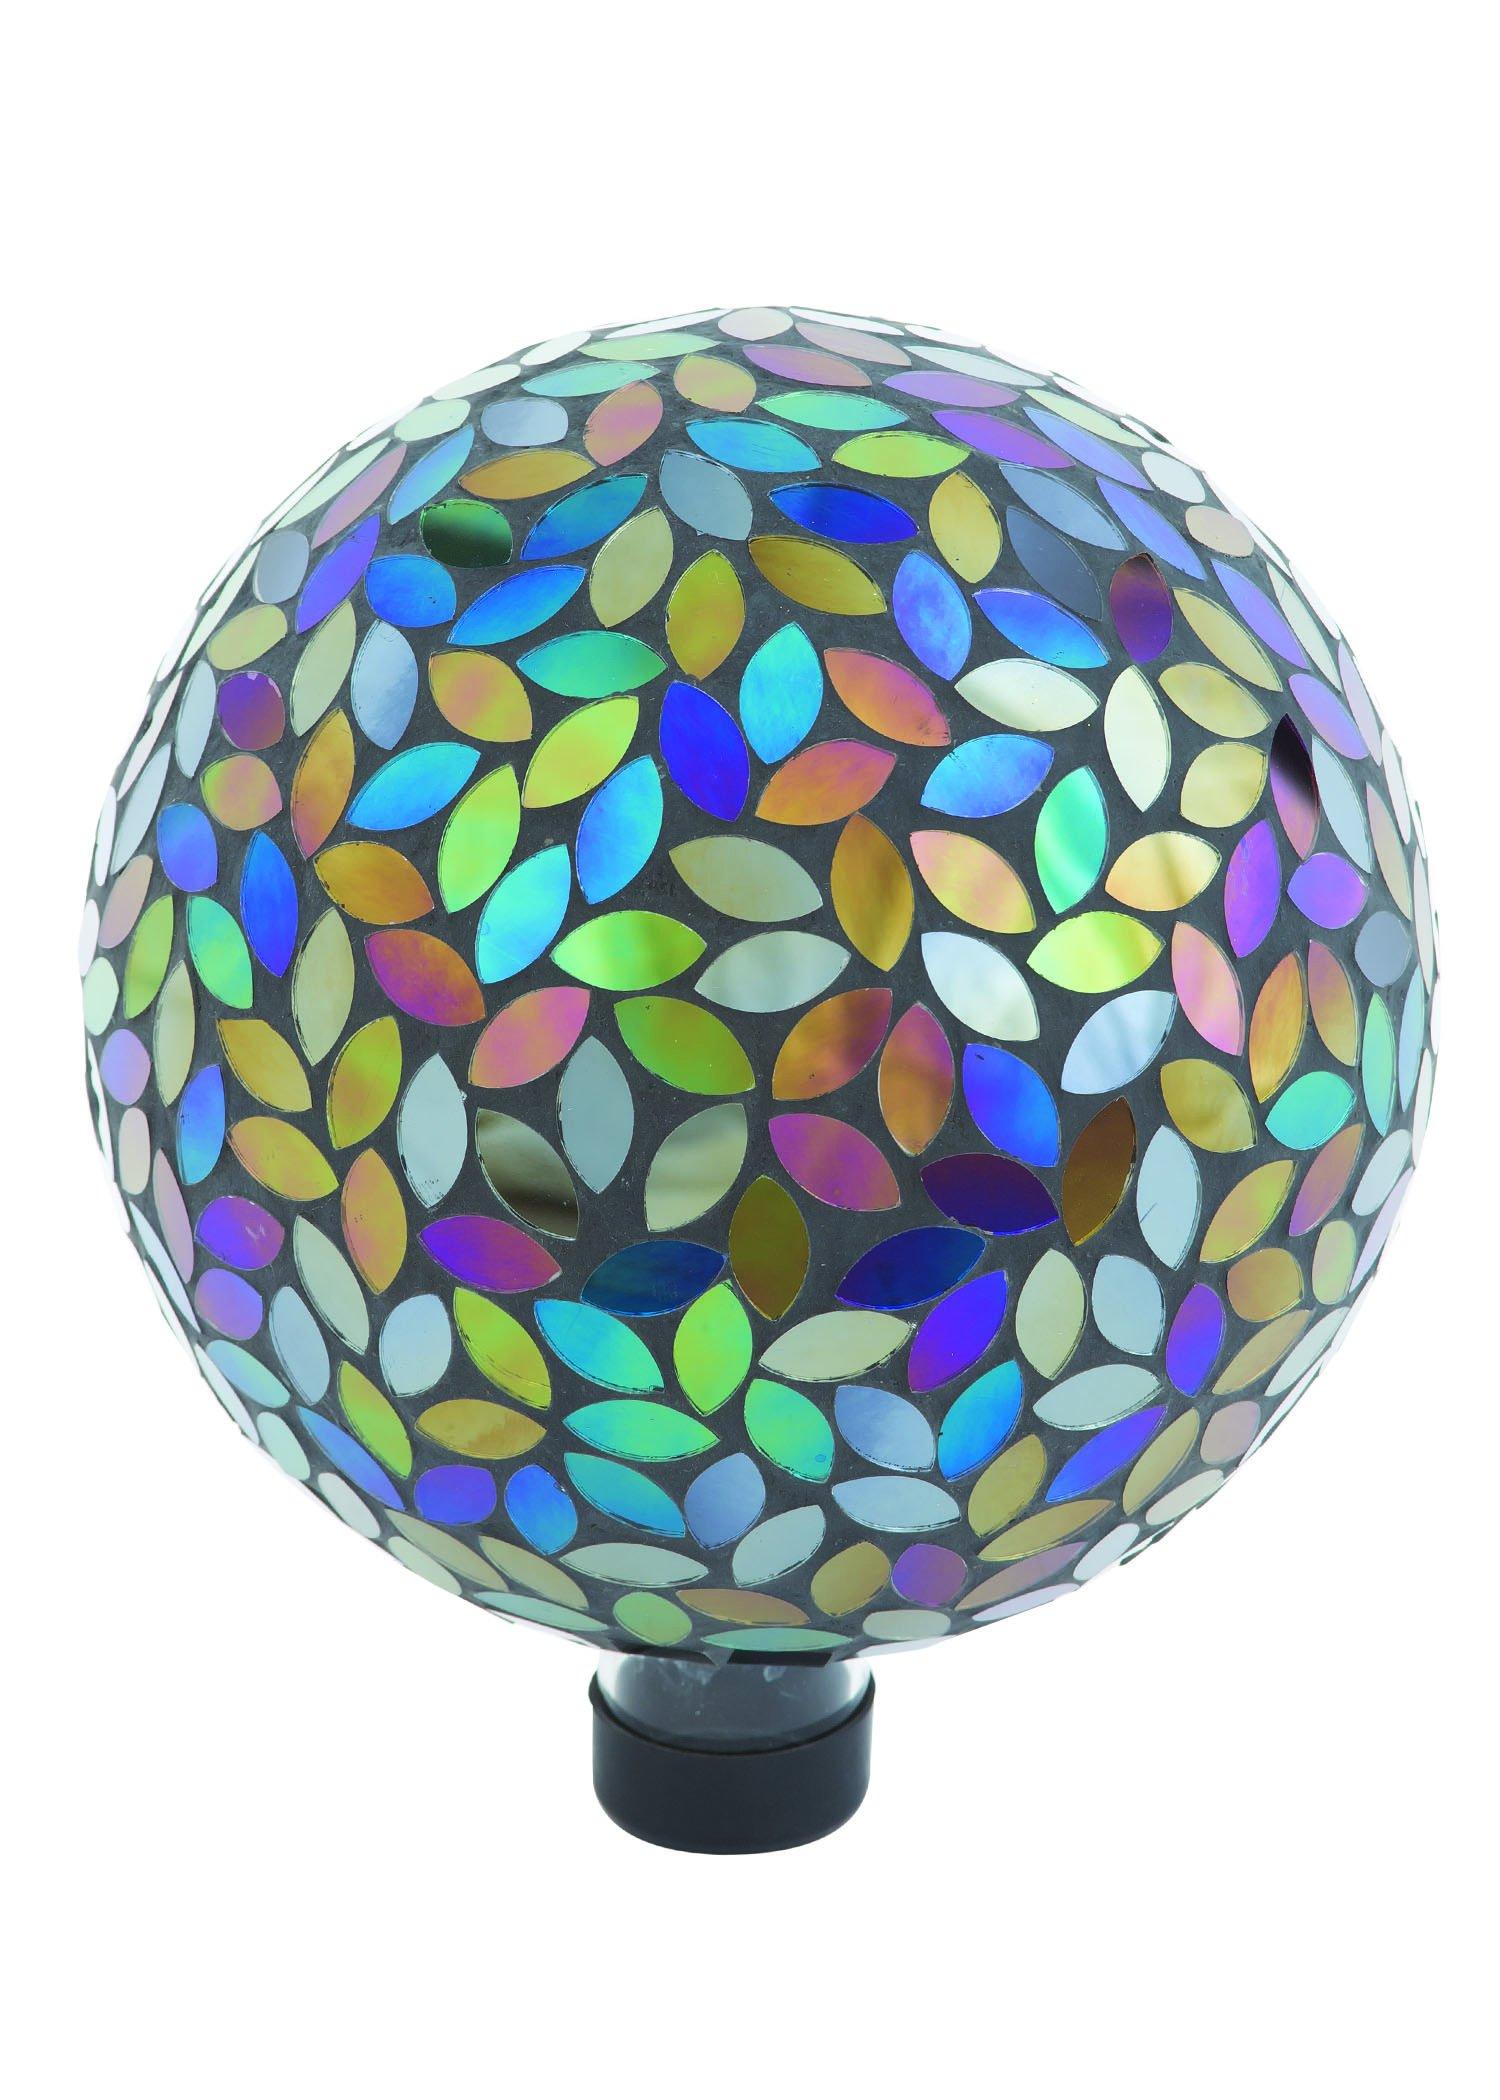 Russco III GD137159 Glass Gazing Ball, 10'', Mosaic Peacock by Russco III